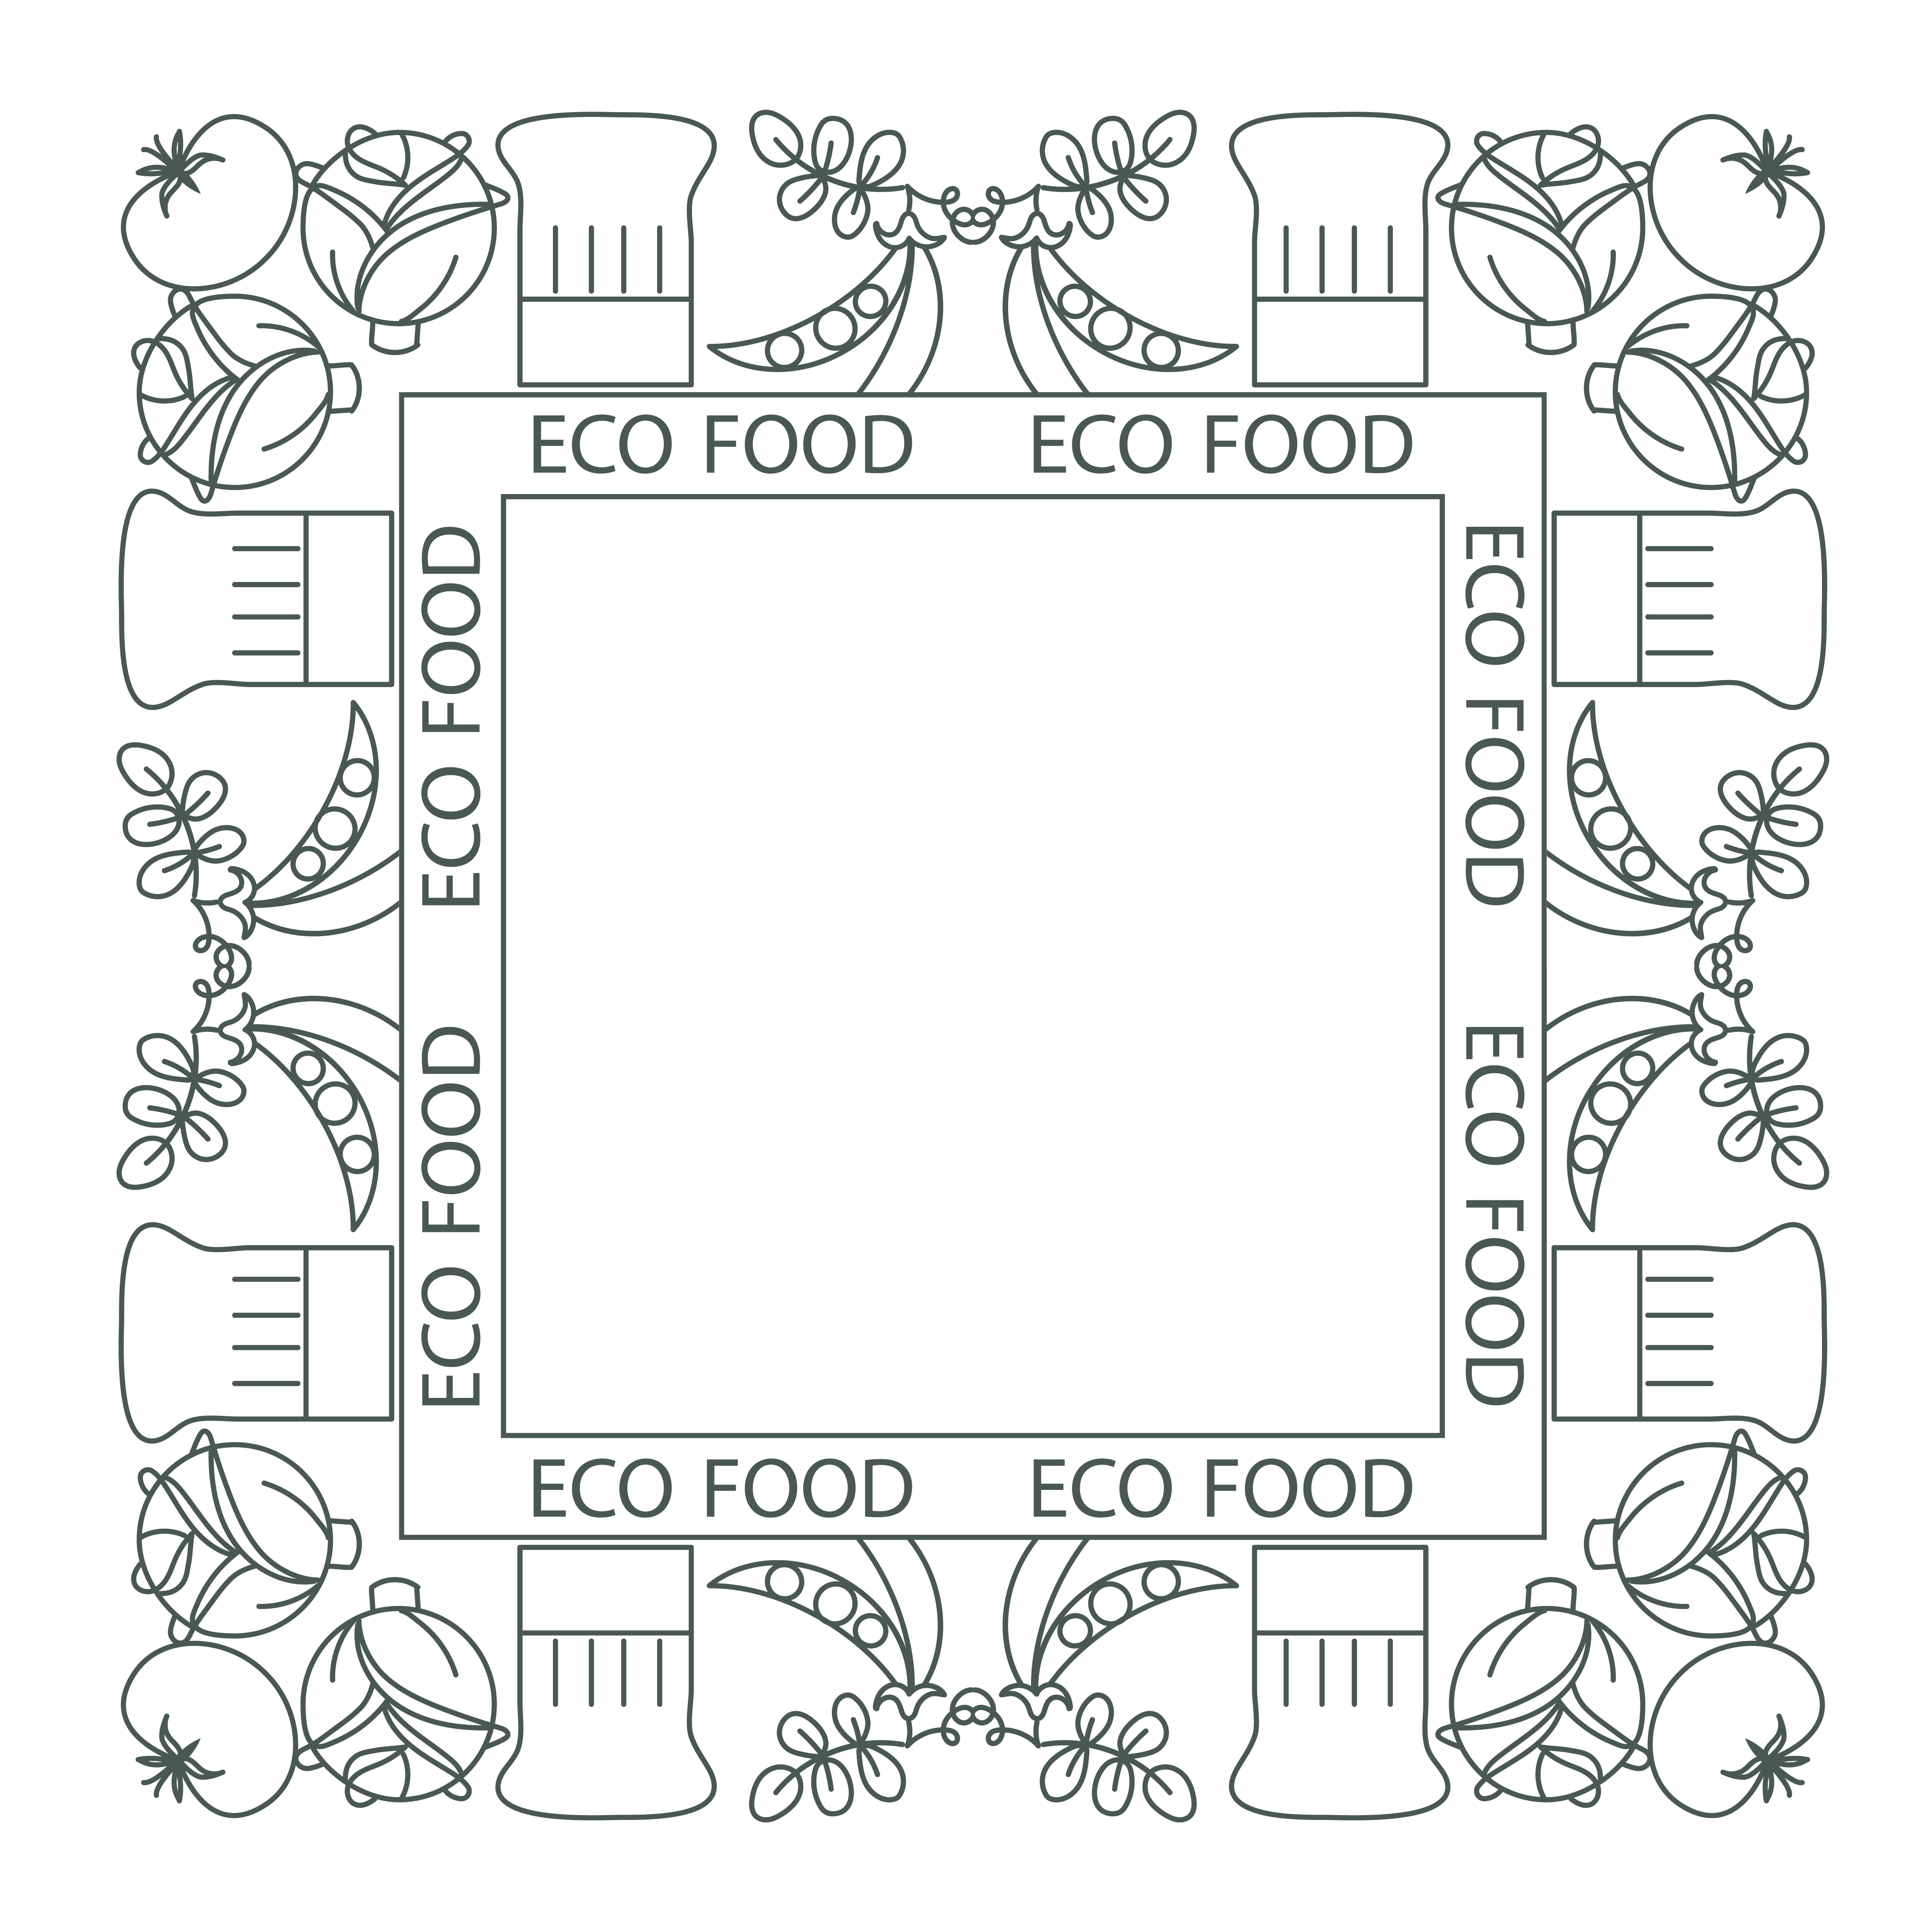 Concept Of Healthy Food Frame Border Download Free Vectors Clipart Graphics Vector Art